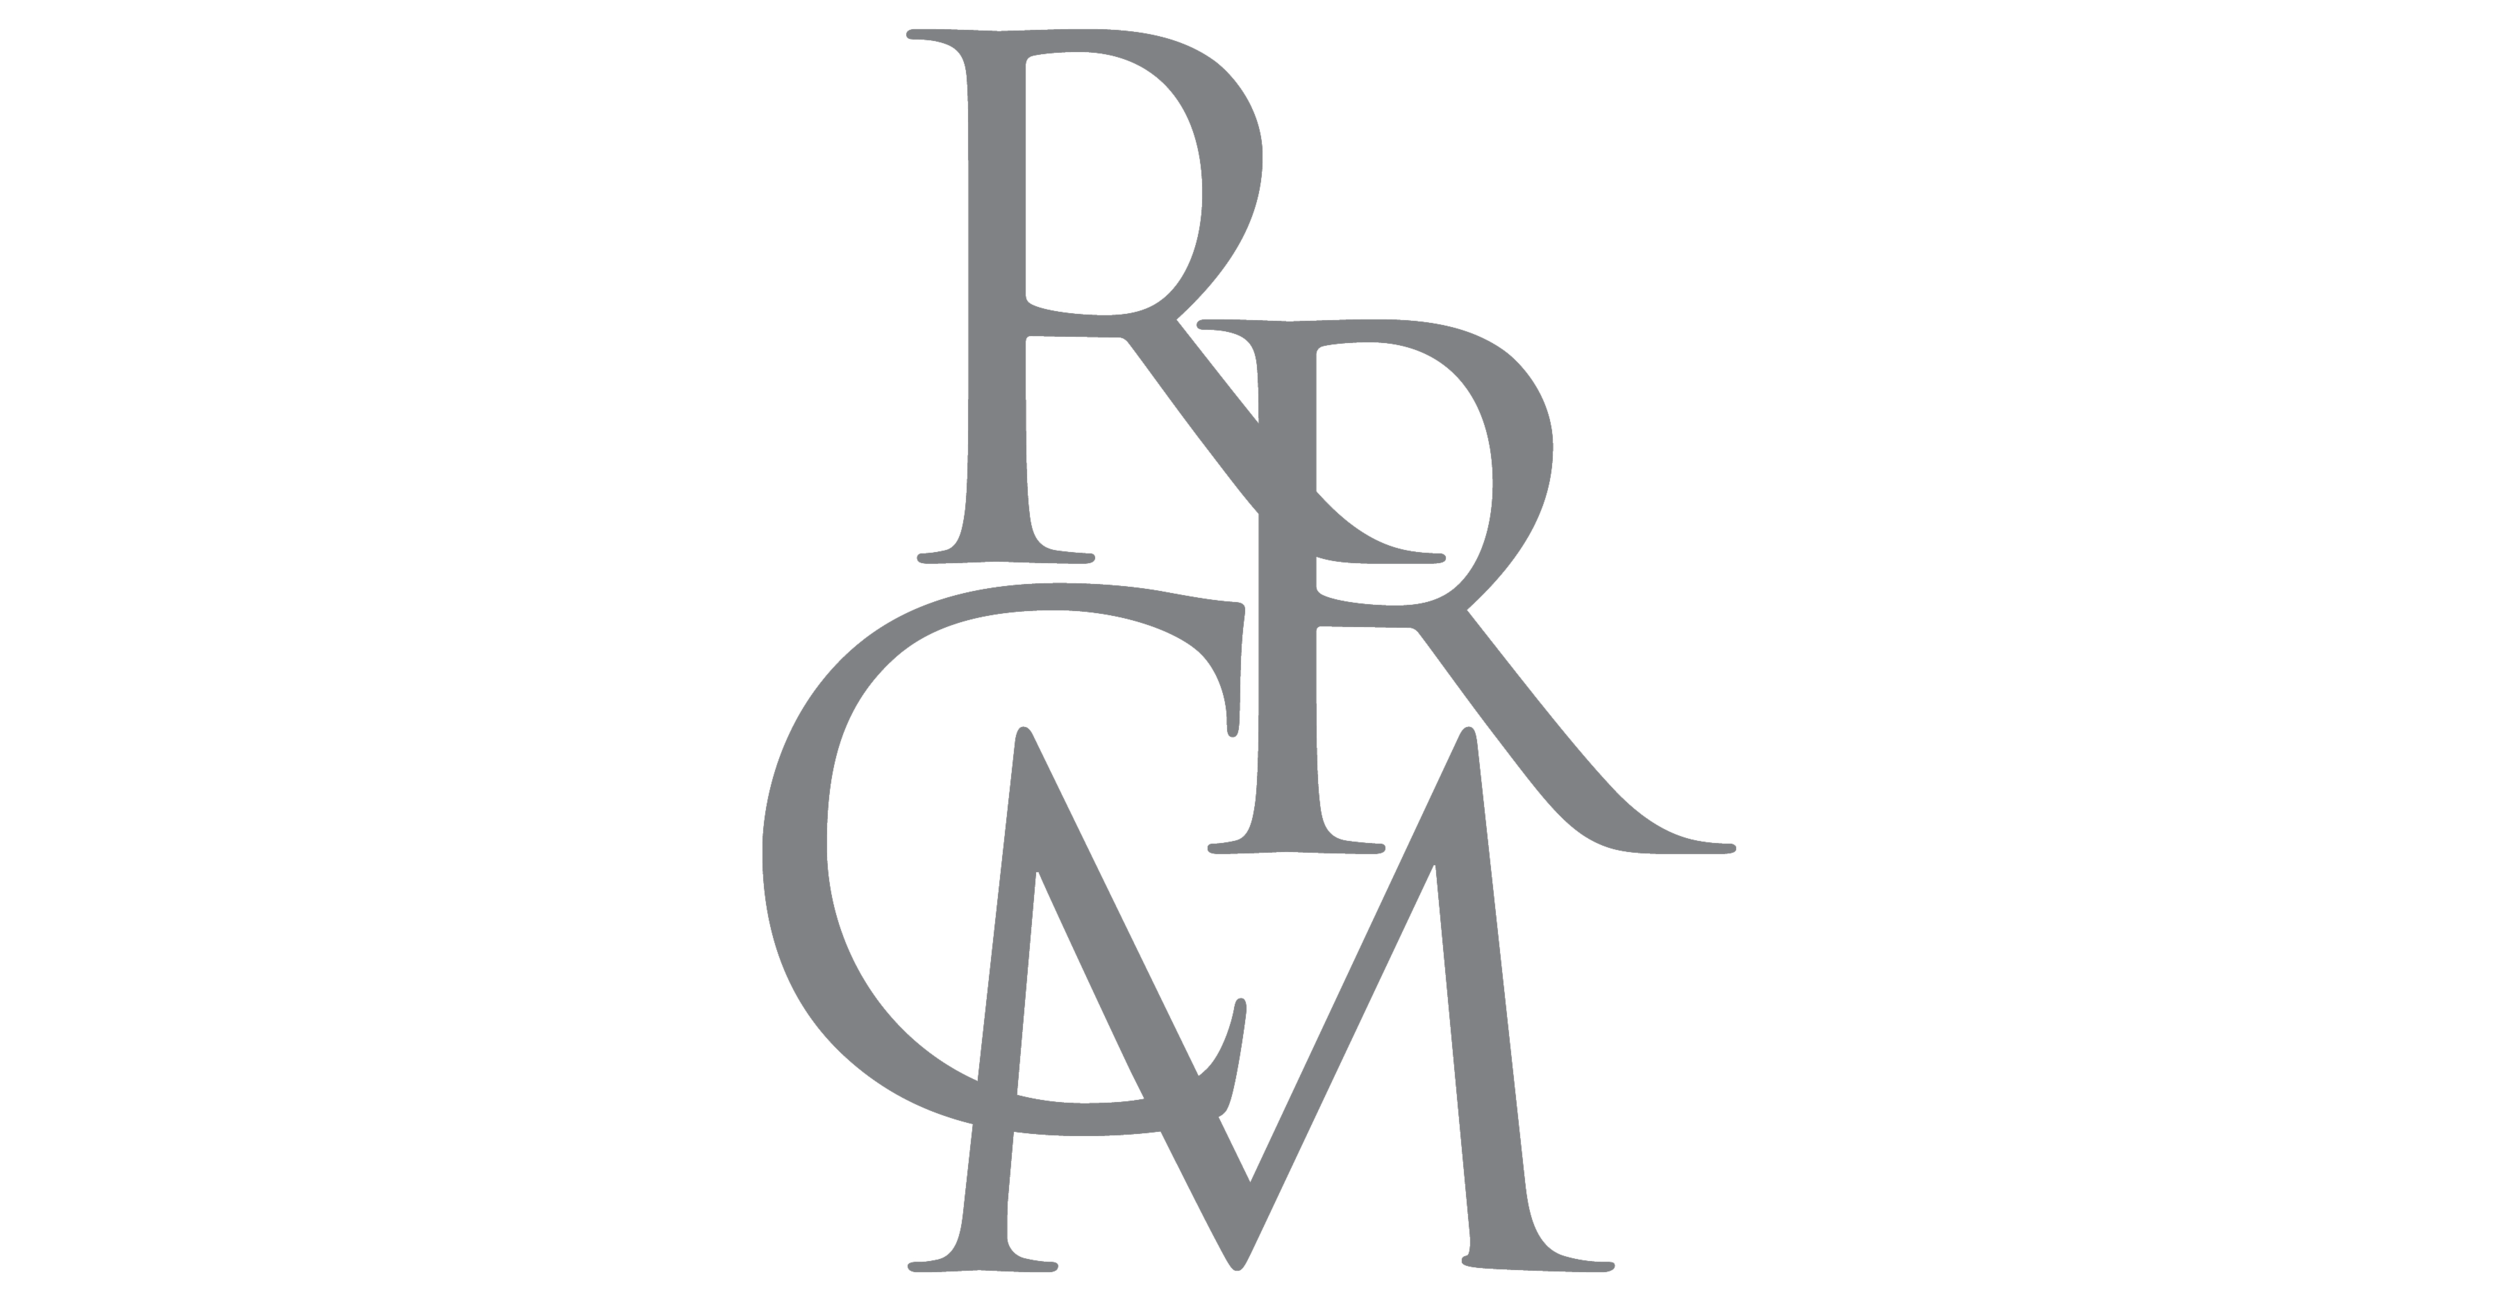 RRCM-logo2.png